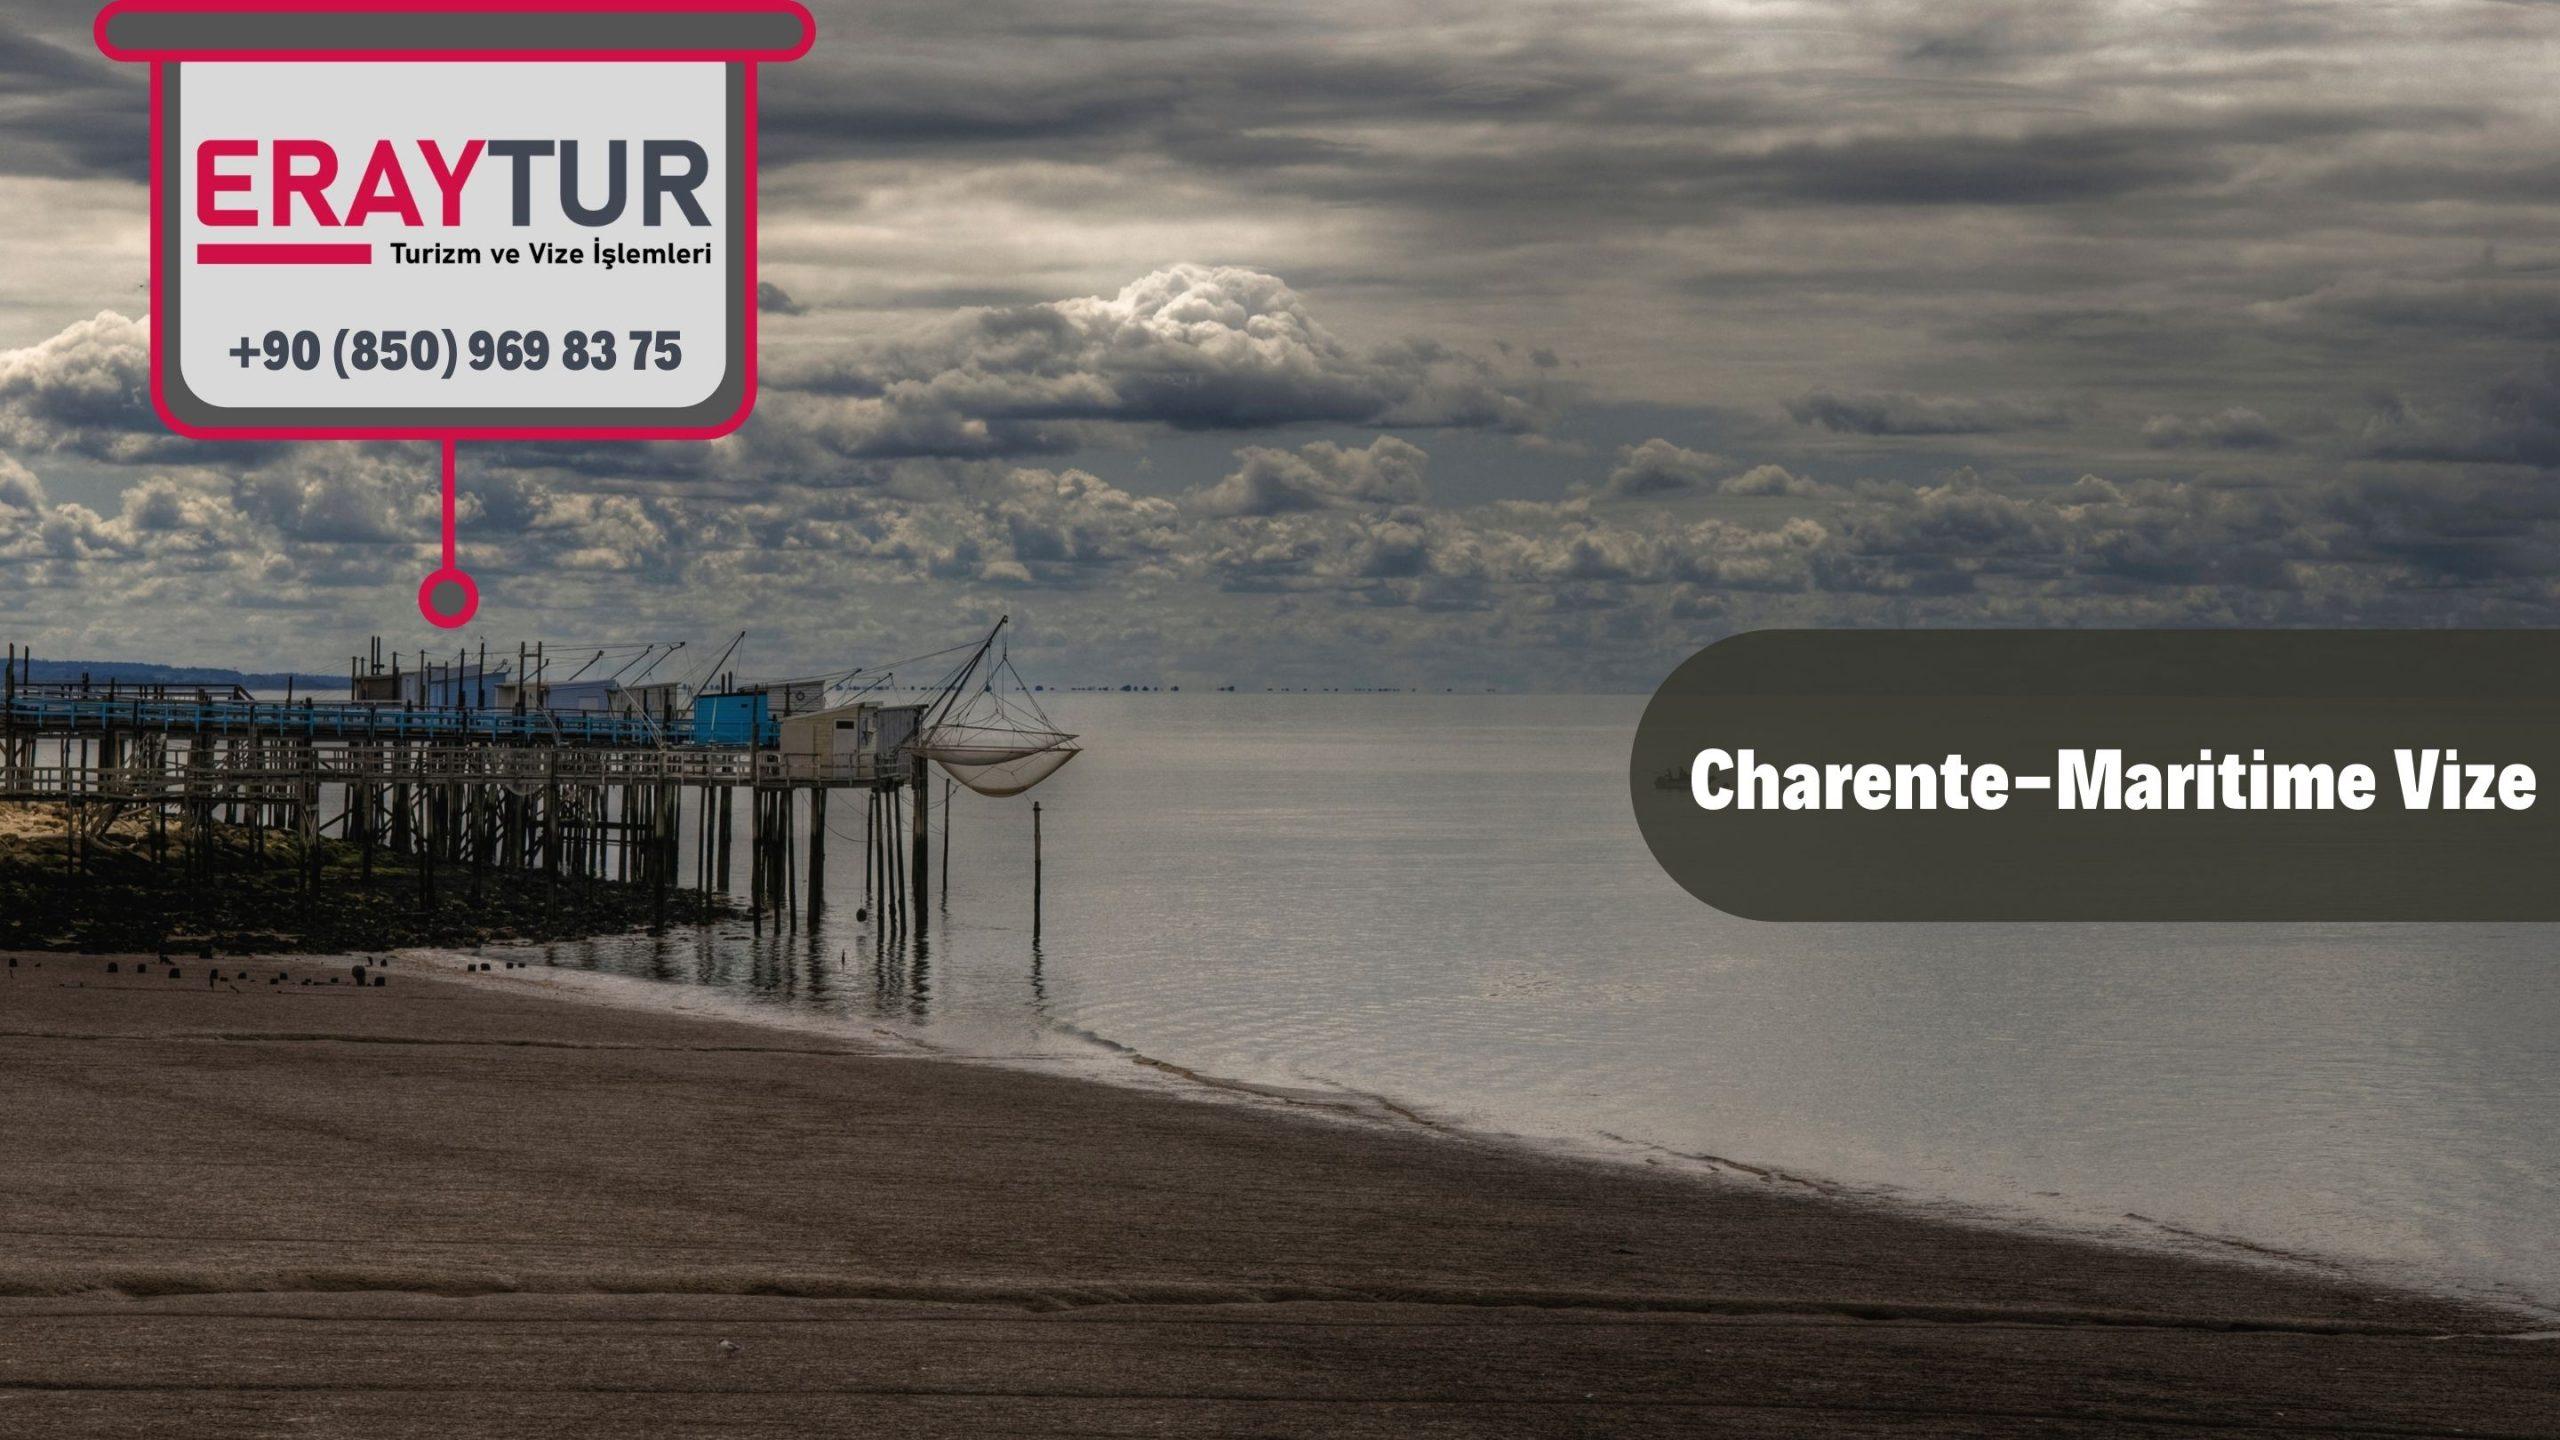 Fransa Charente- Maritime Vize Başvurusu